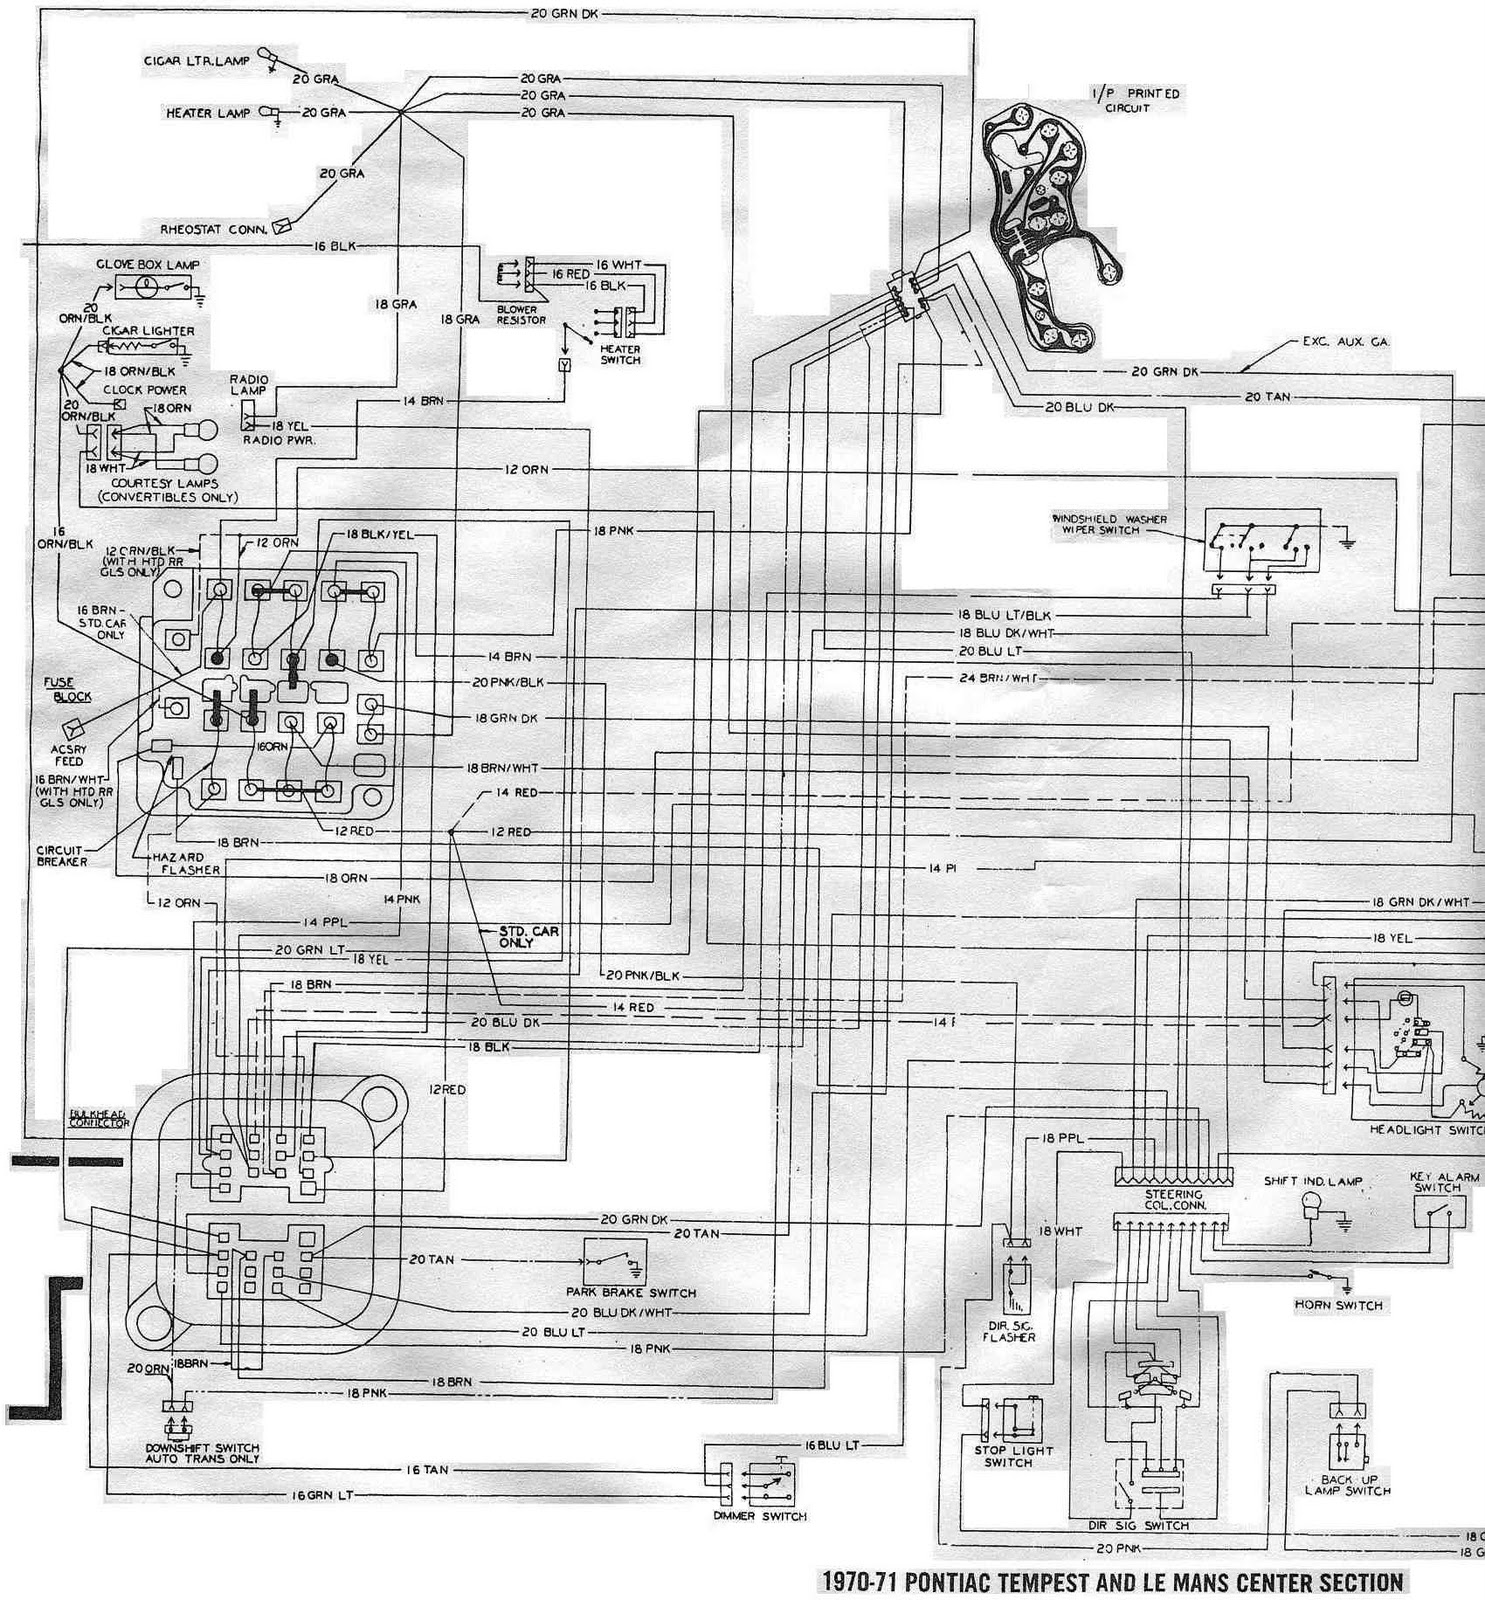 67 gto tach wiring schematic wiring diagrams u2022 rh arcomics co Auto Meter Tach Wiring Tach Wiring Diagram